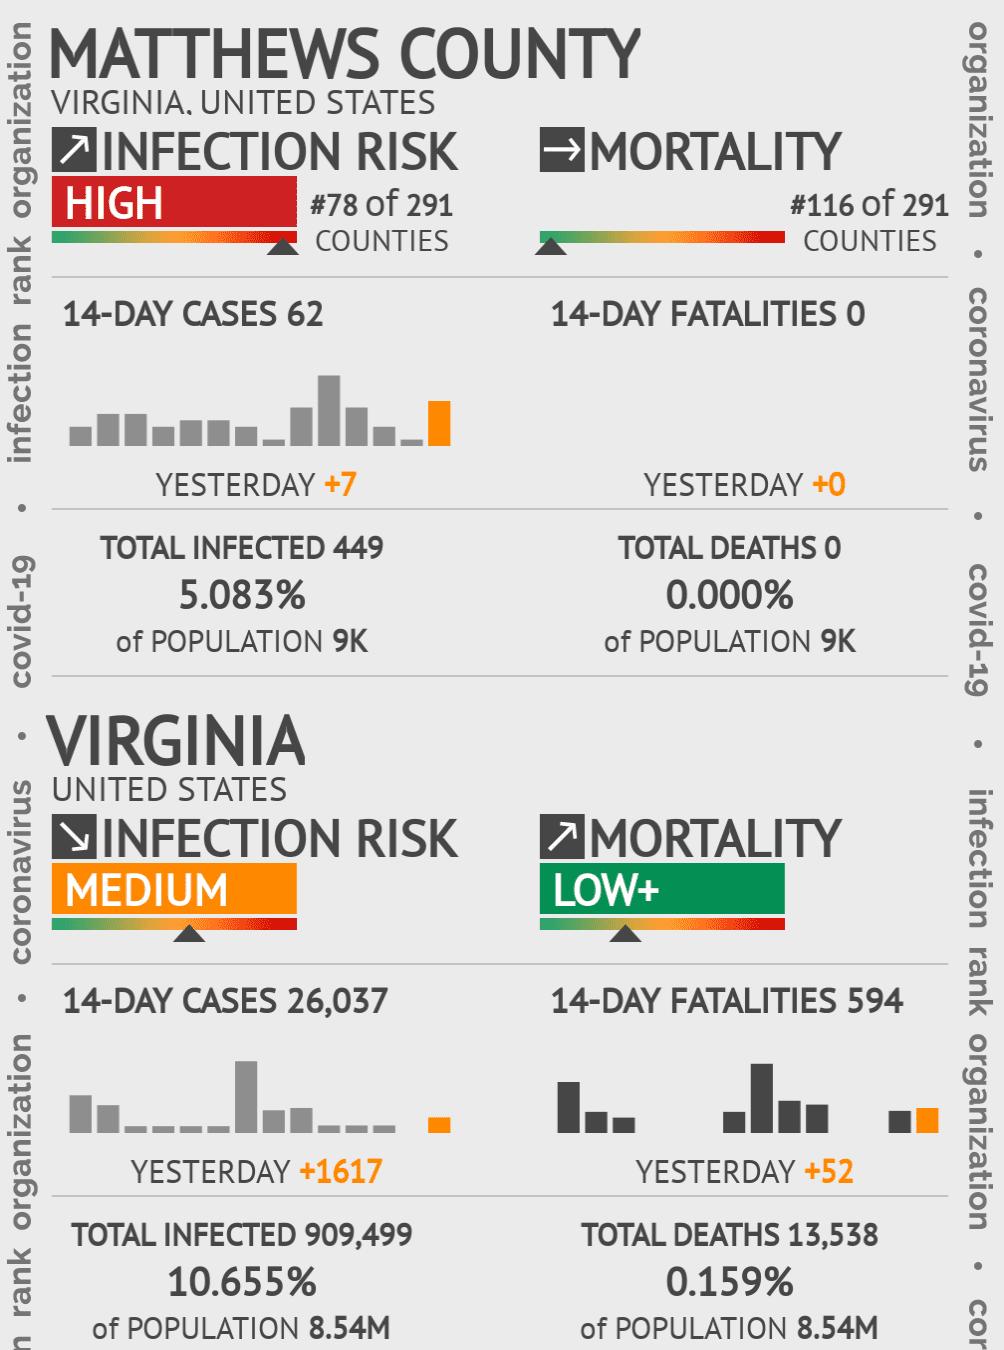 Matthews County Coronavirus Covid-19 Risk of Infection on February 04, 2021